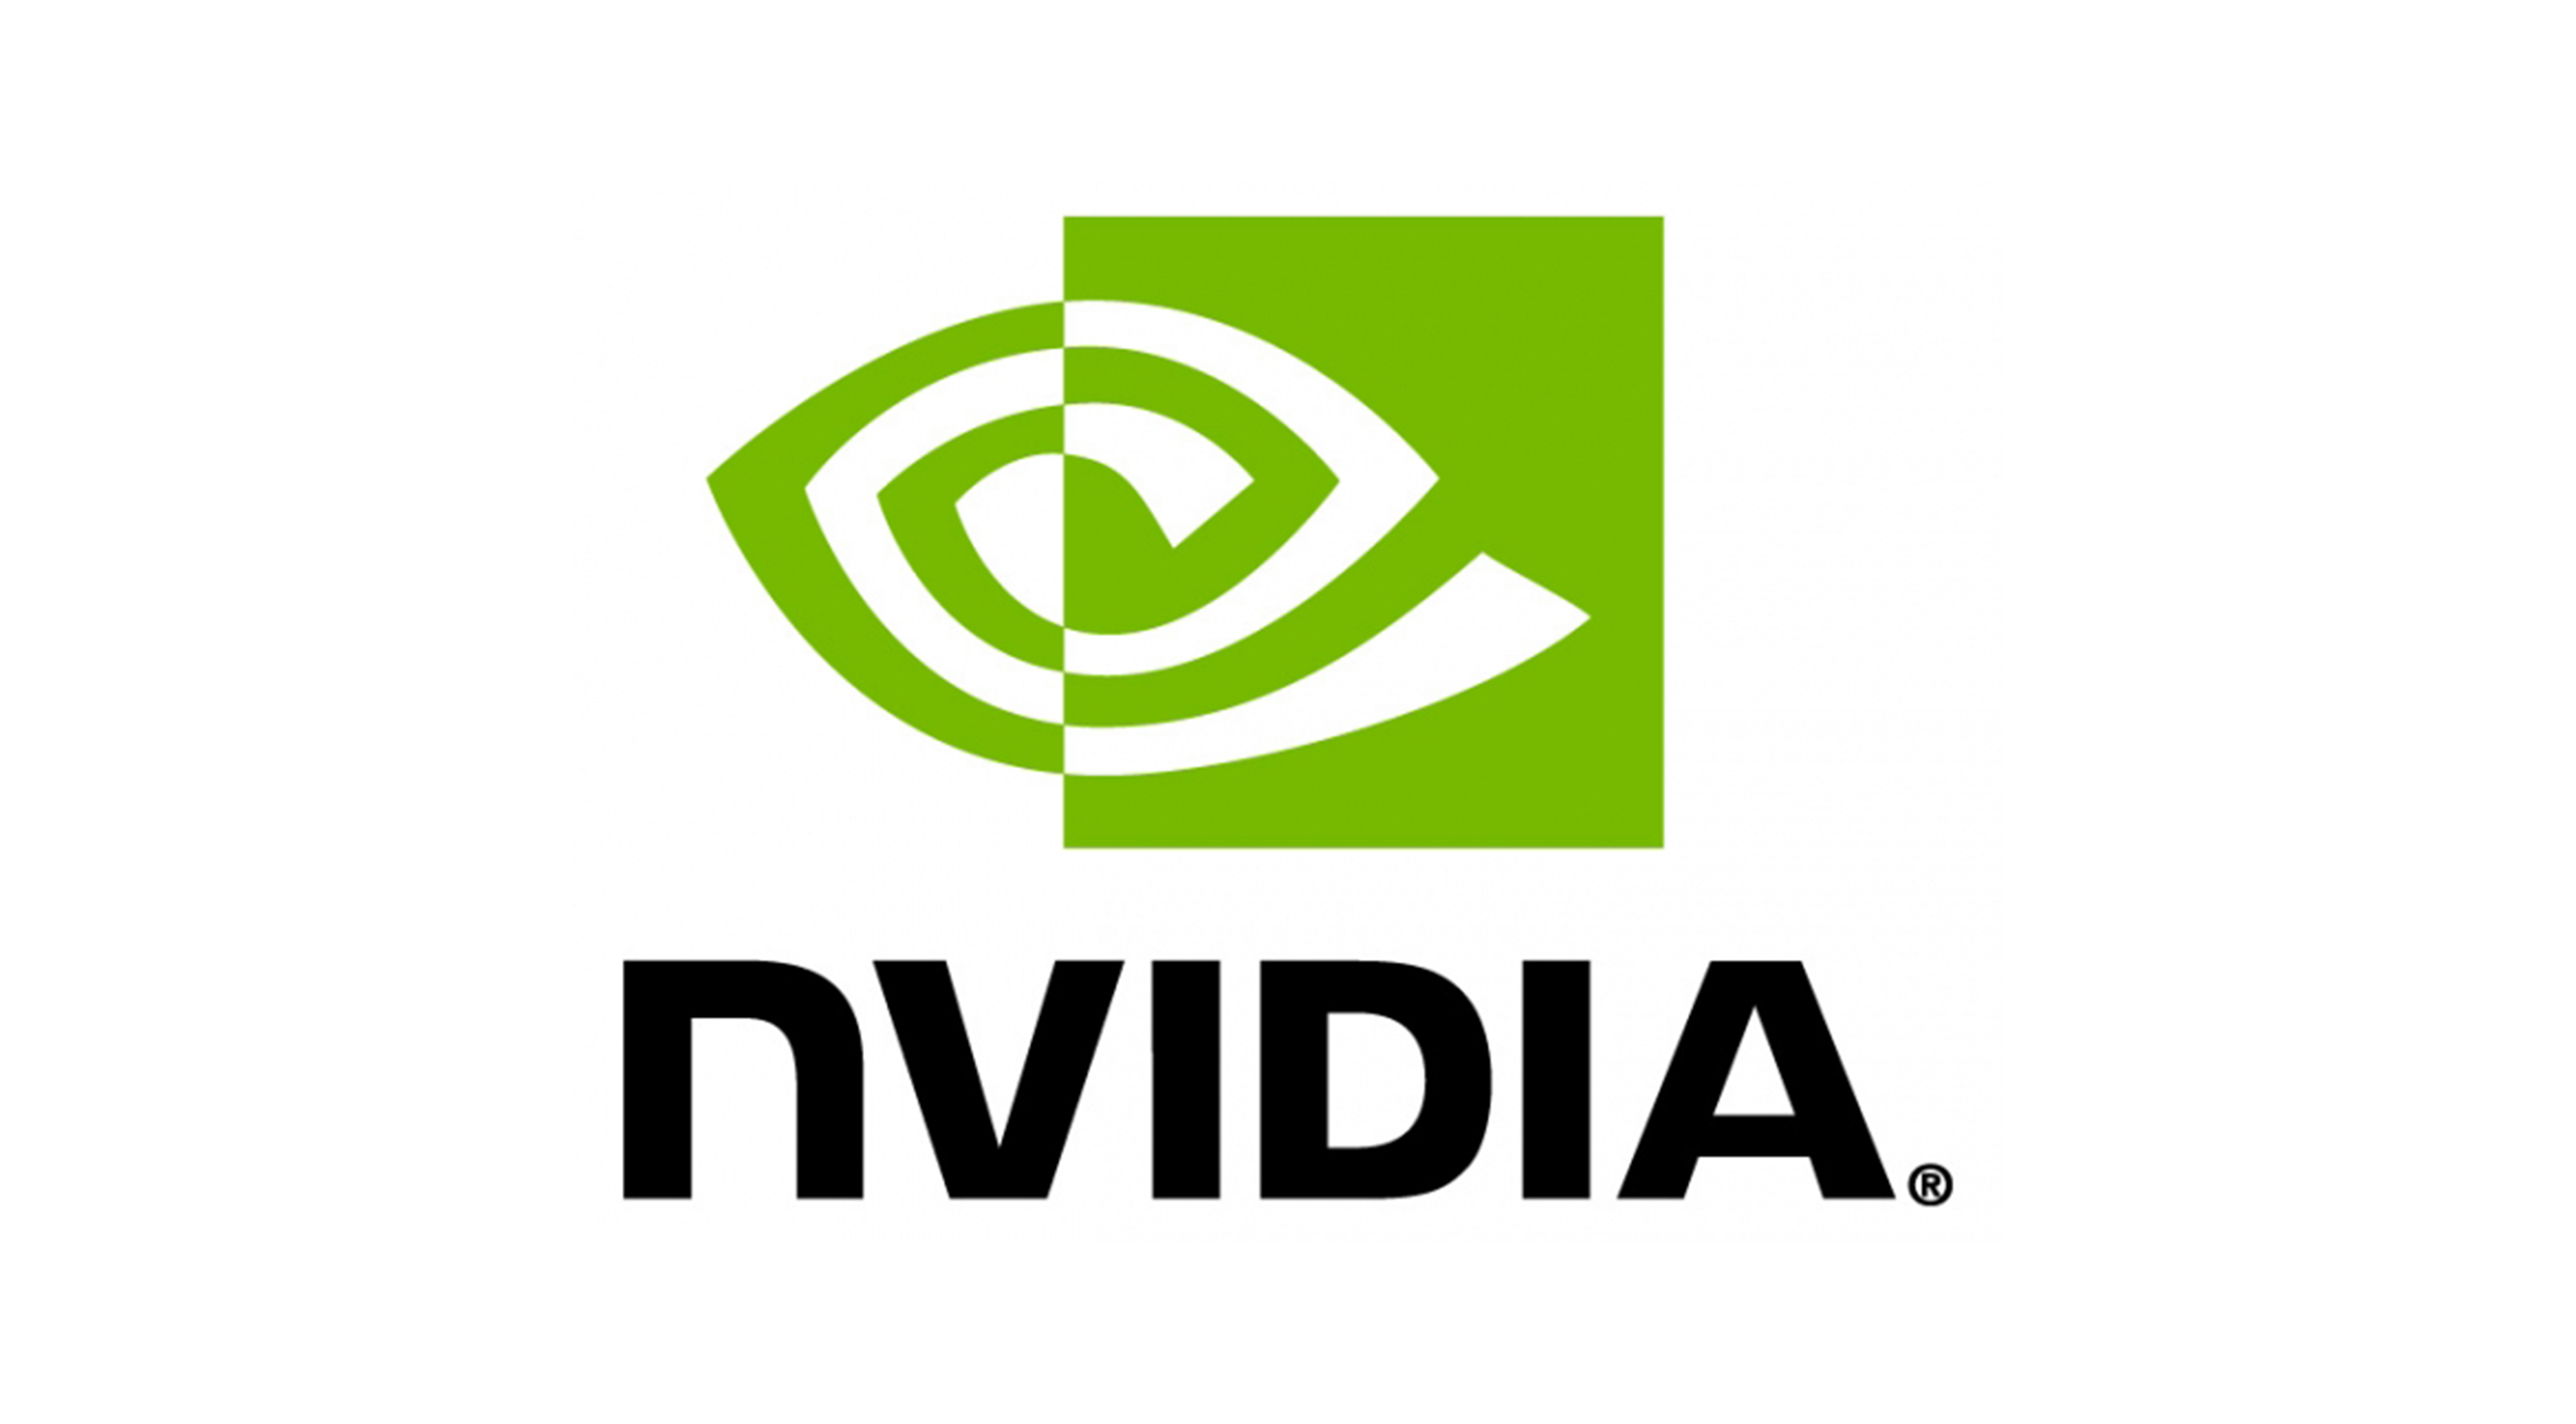 NVIDIAとTRI-AD、自動運転とAI技術に関する新しいテストと検証のシステムでの協業を発表